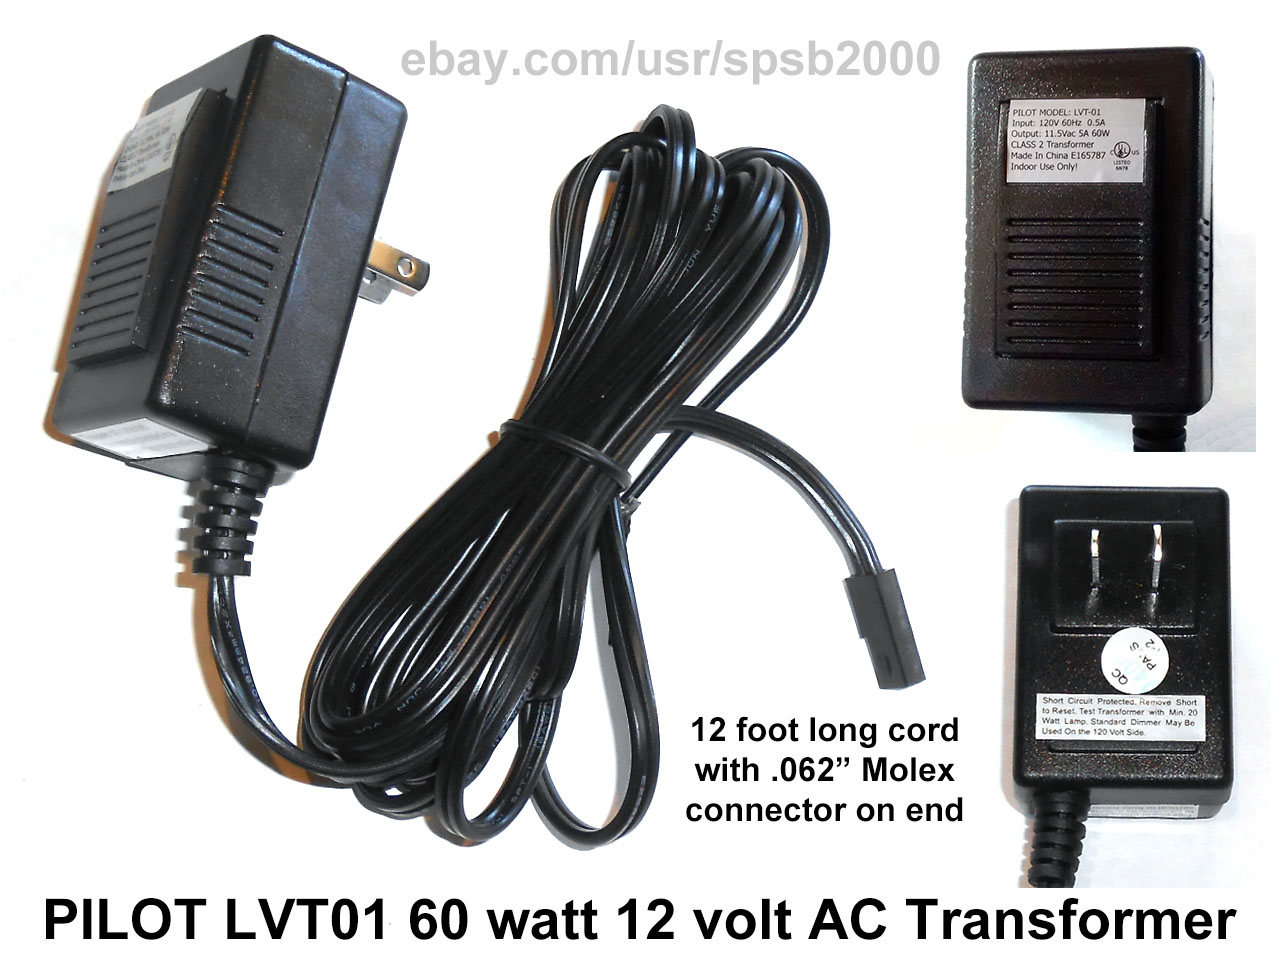 Outdoor lighting transformers 12v democraciaejustica 60watt 12volt plug in transformer 60w 120v 12v ac low aloadofball Image collections